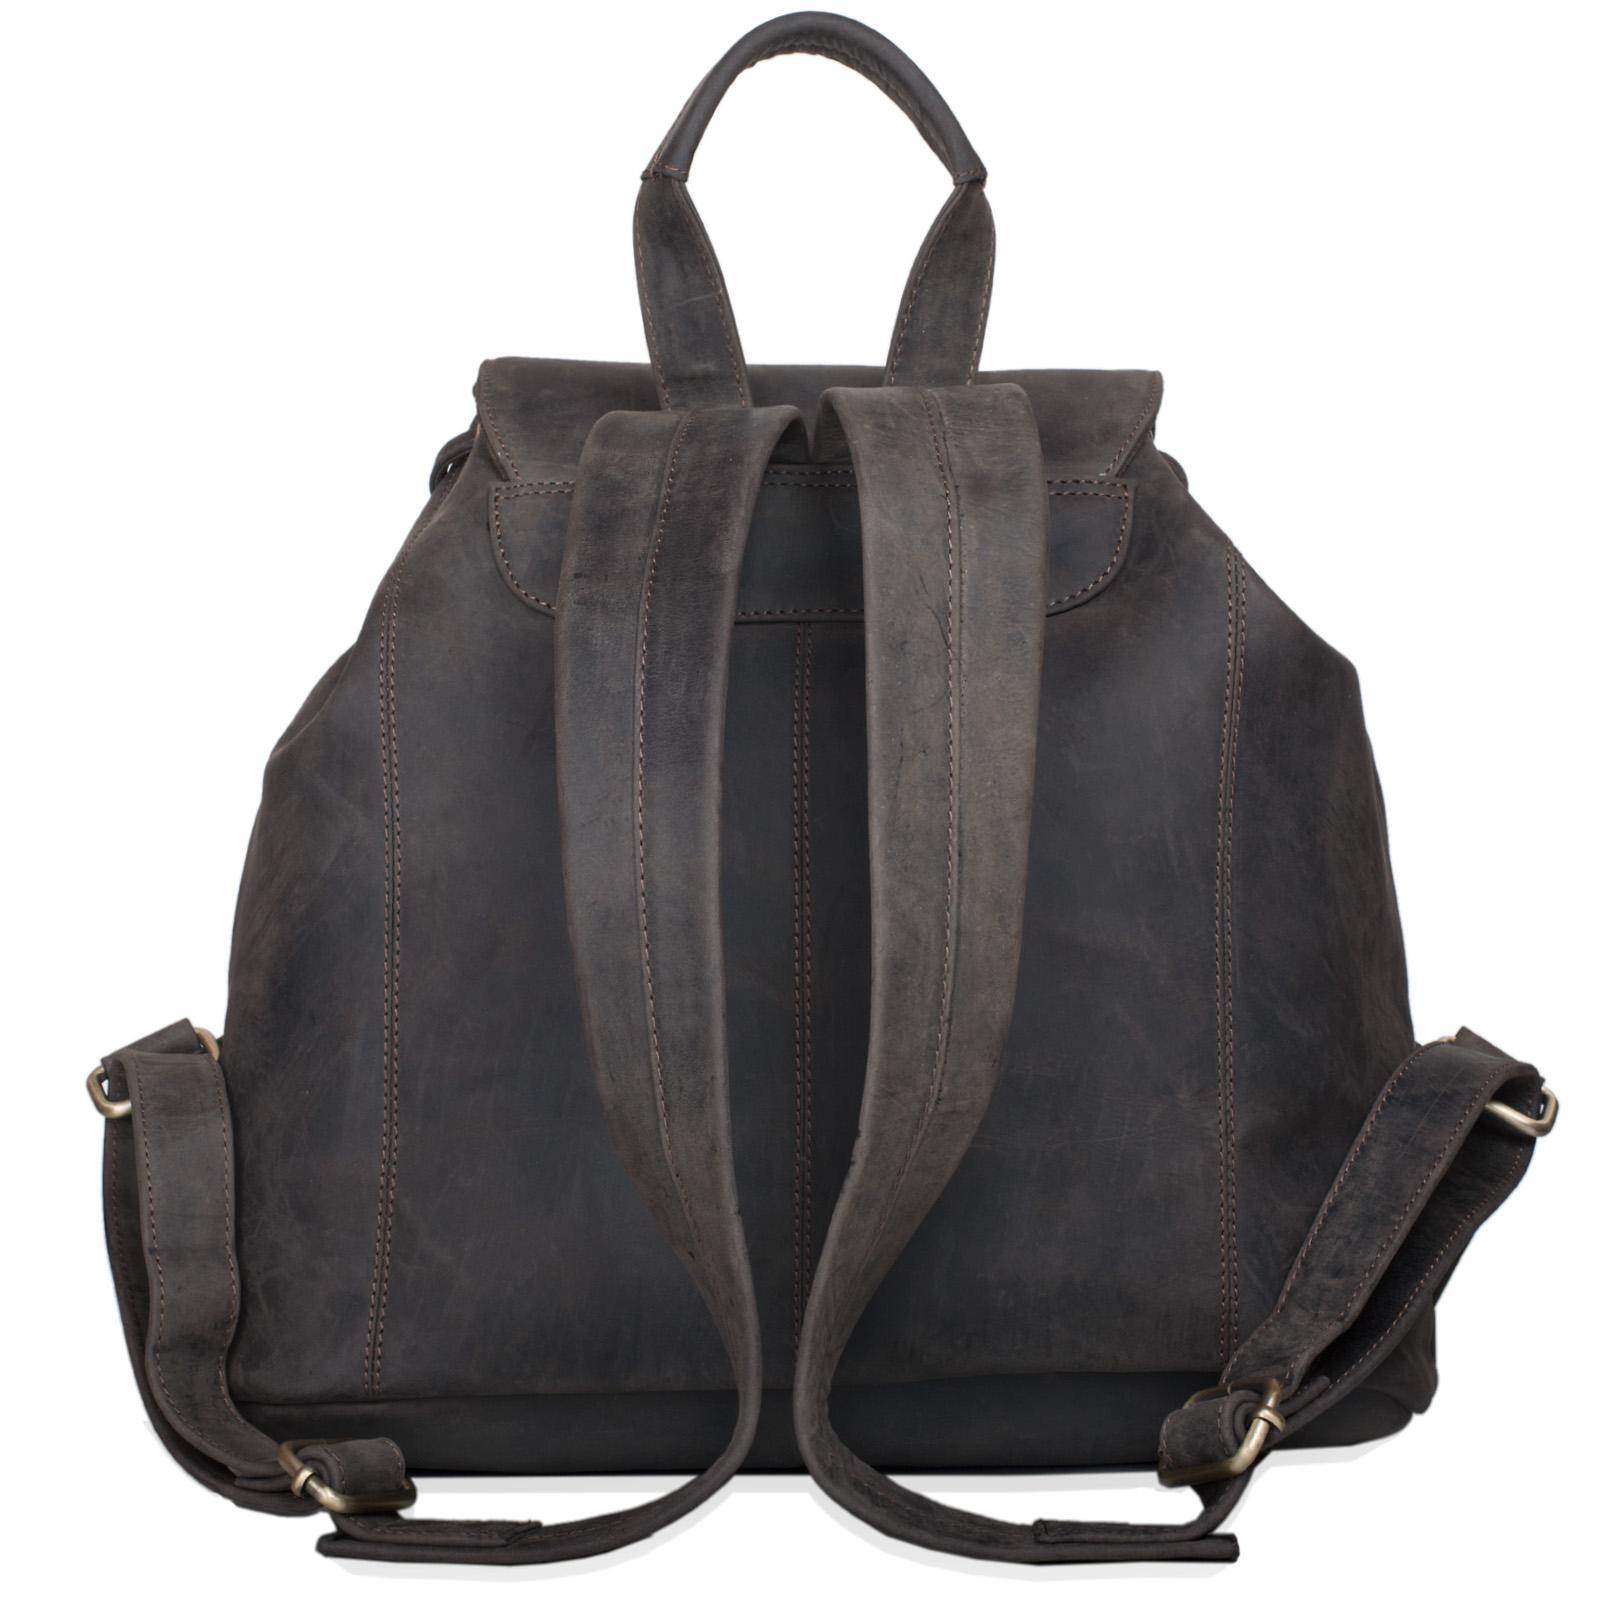 "STILORD ""Larissa"" Vintage Rucksack Leder Damen Rucksackhandtasche Lederrucksack Handtasche DIN A4 City Shopping Daypack Schule Uni - Bild 17"